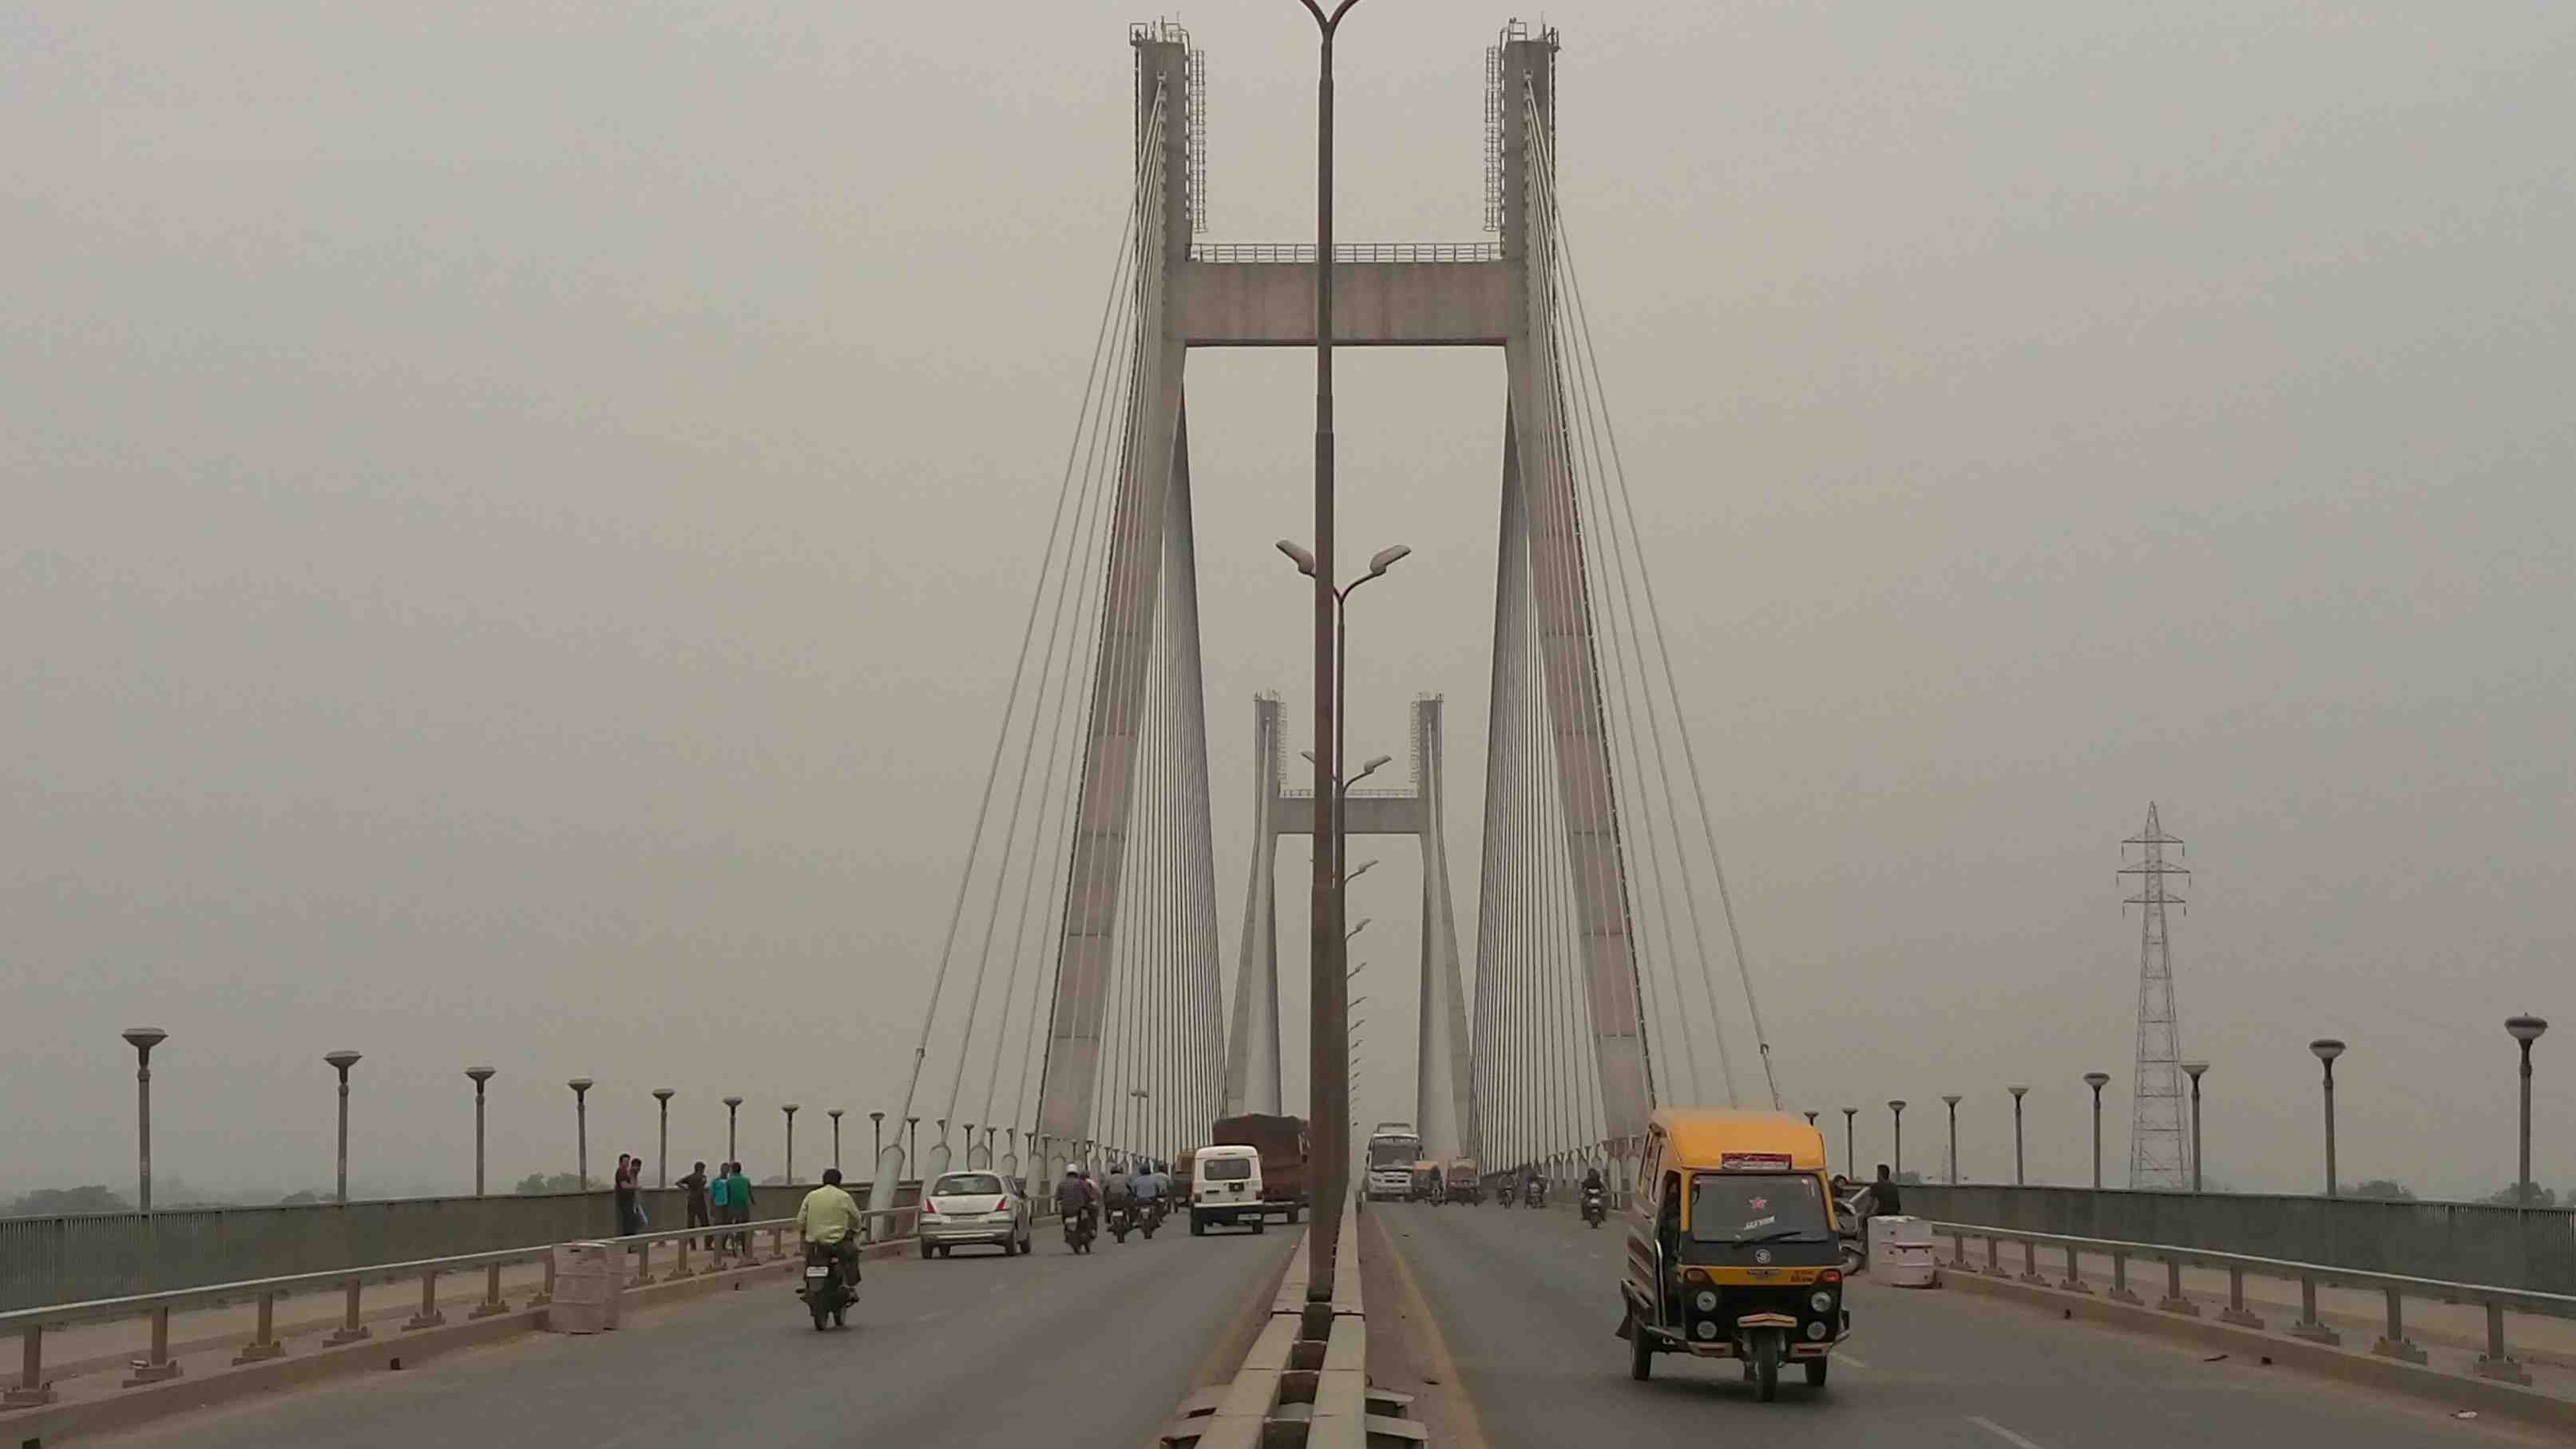 Allahabad Bridge